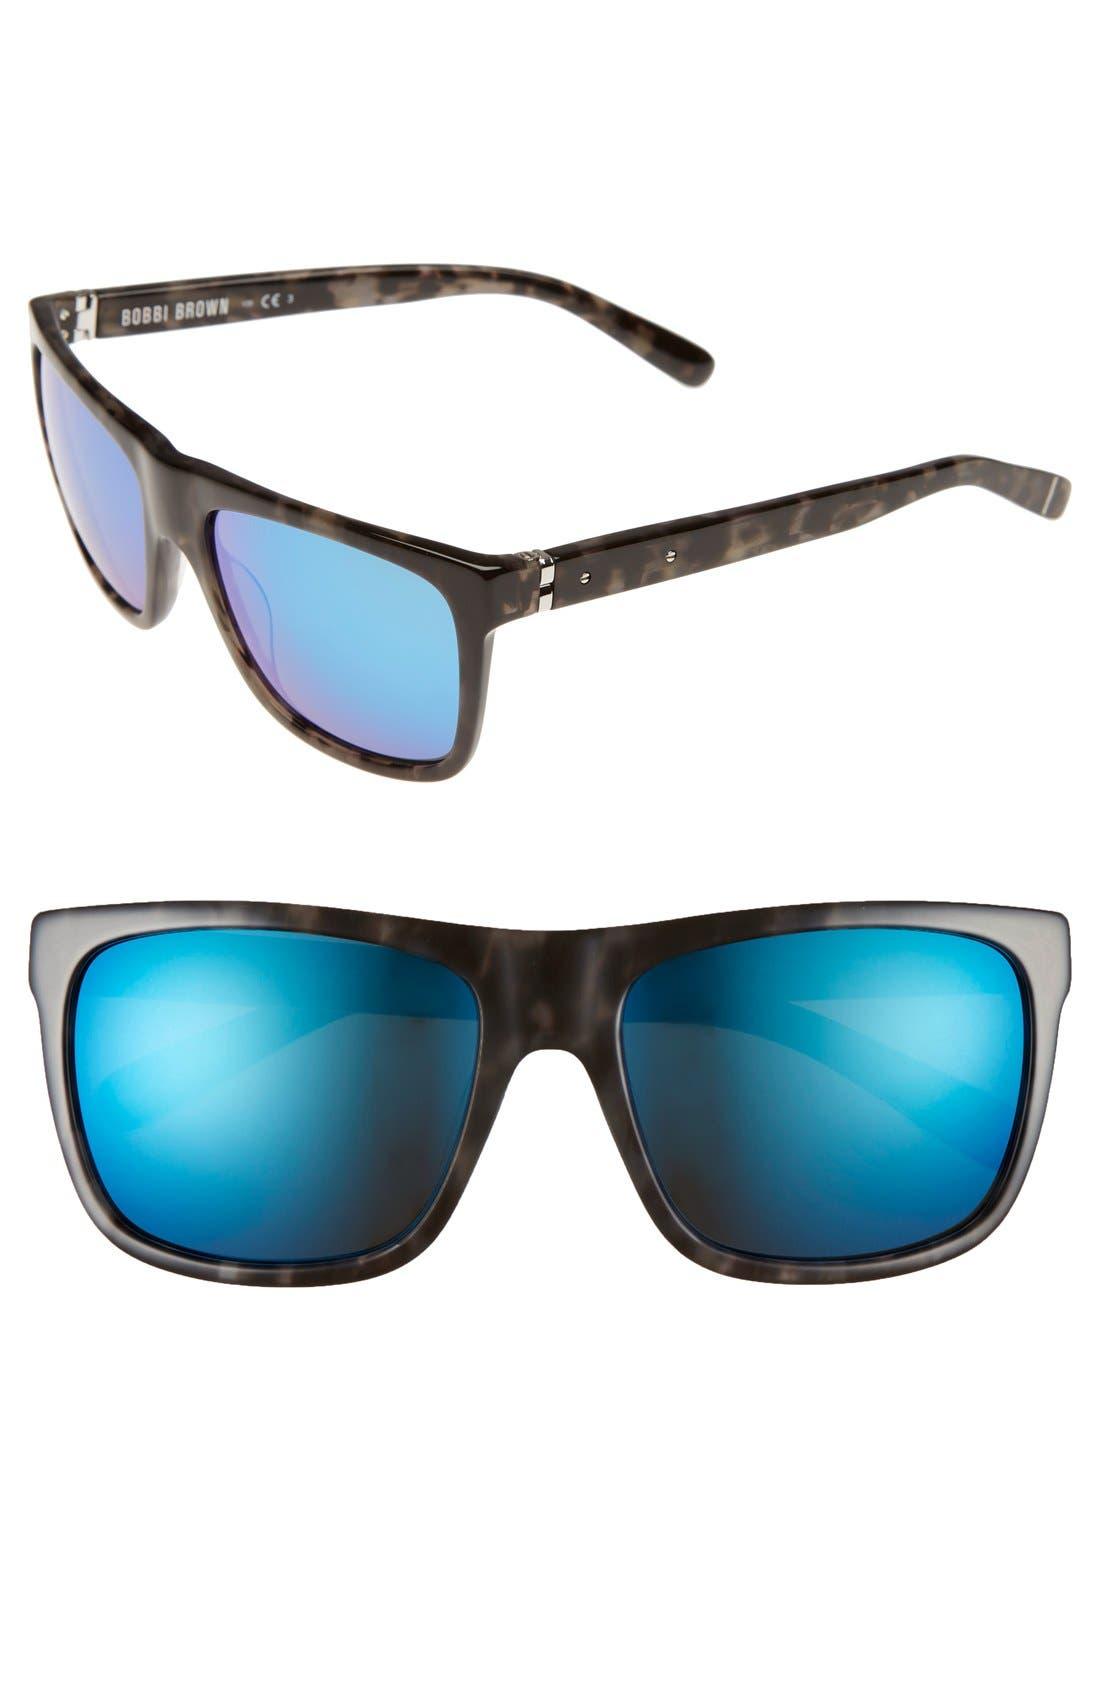 Alternate Image 1 Selected - Bobbi Brown 'The Harley' 55mm Sunglasses